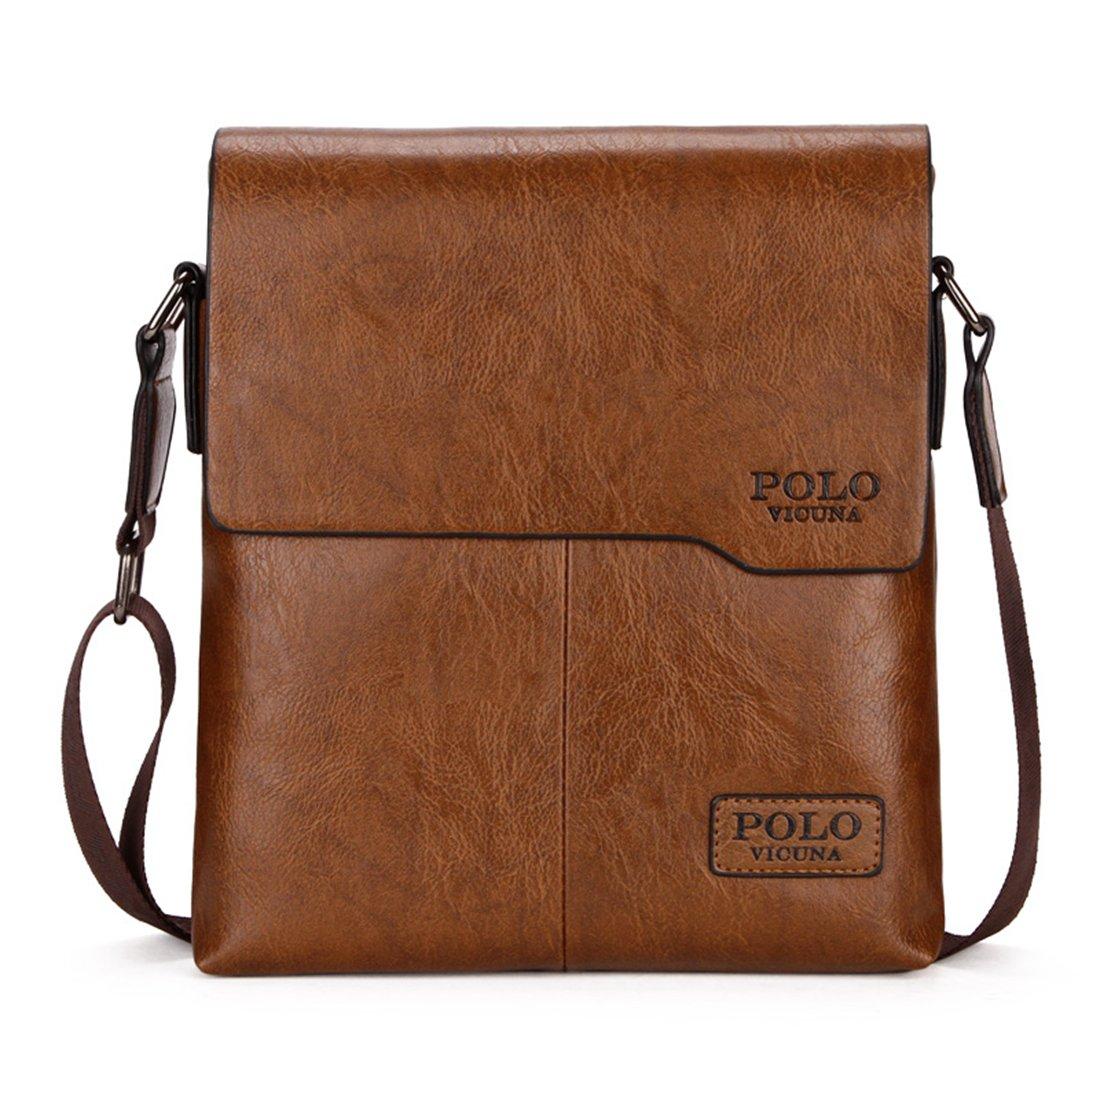 8d32a3eb61b4 VICUNA POLO Men Messenger Bag High Quality Leather Crossbody Bag Shoulder  Bag (Khaki)  Amazon.co.uk  Shoes   Bags